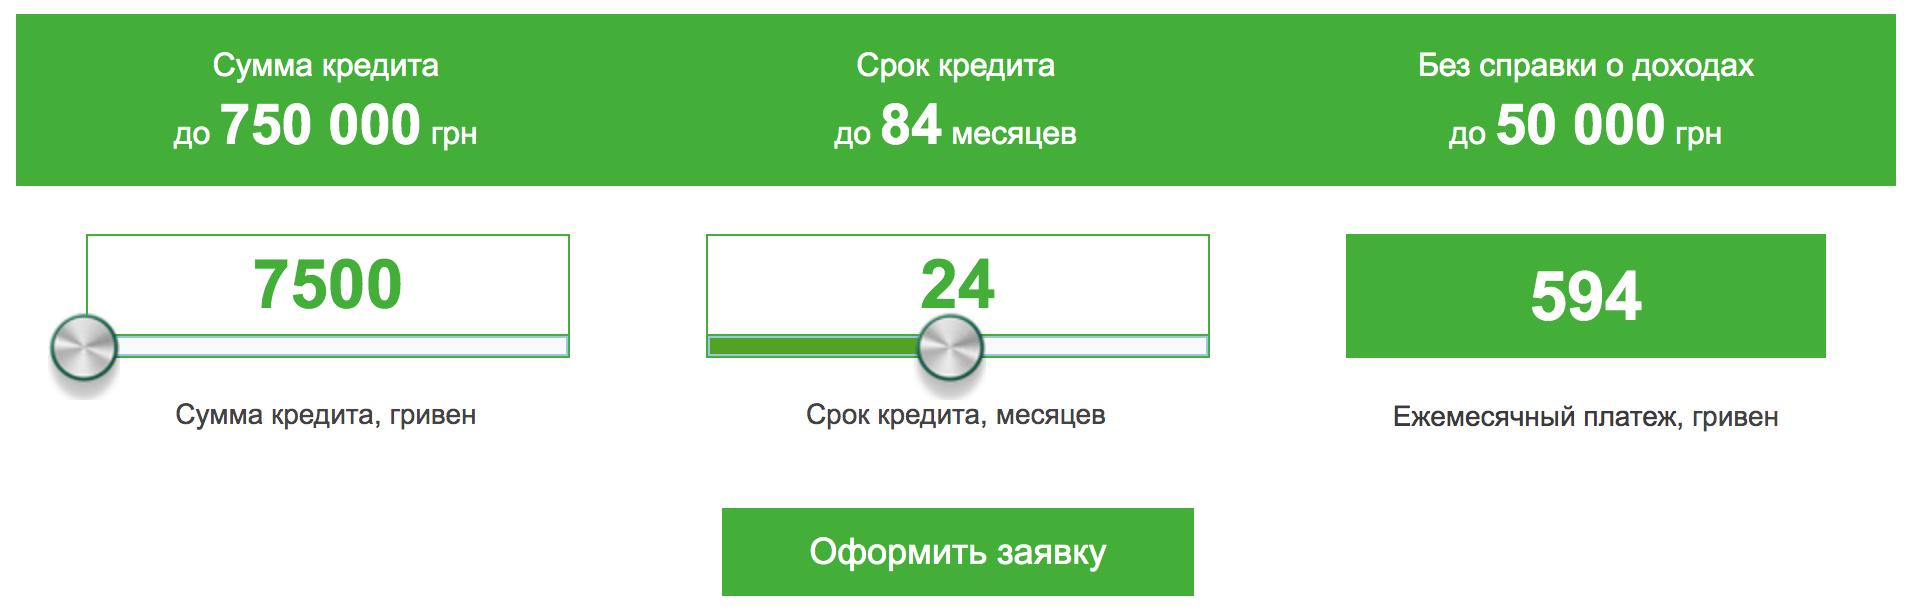 Фото otpbank.com.ua: Расчет выдачи кредита наличными